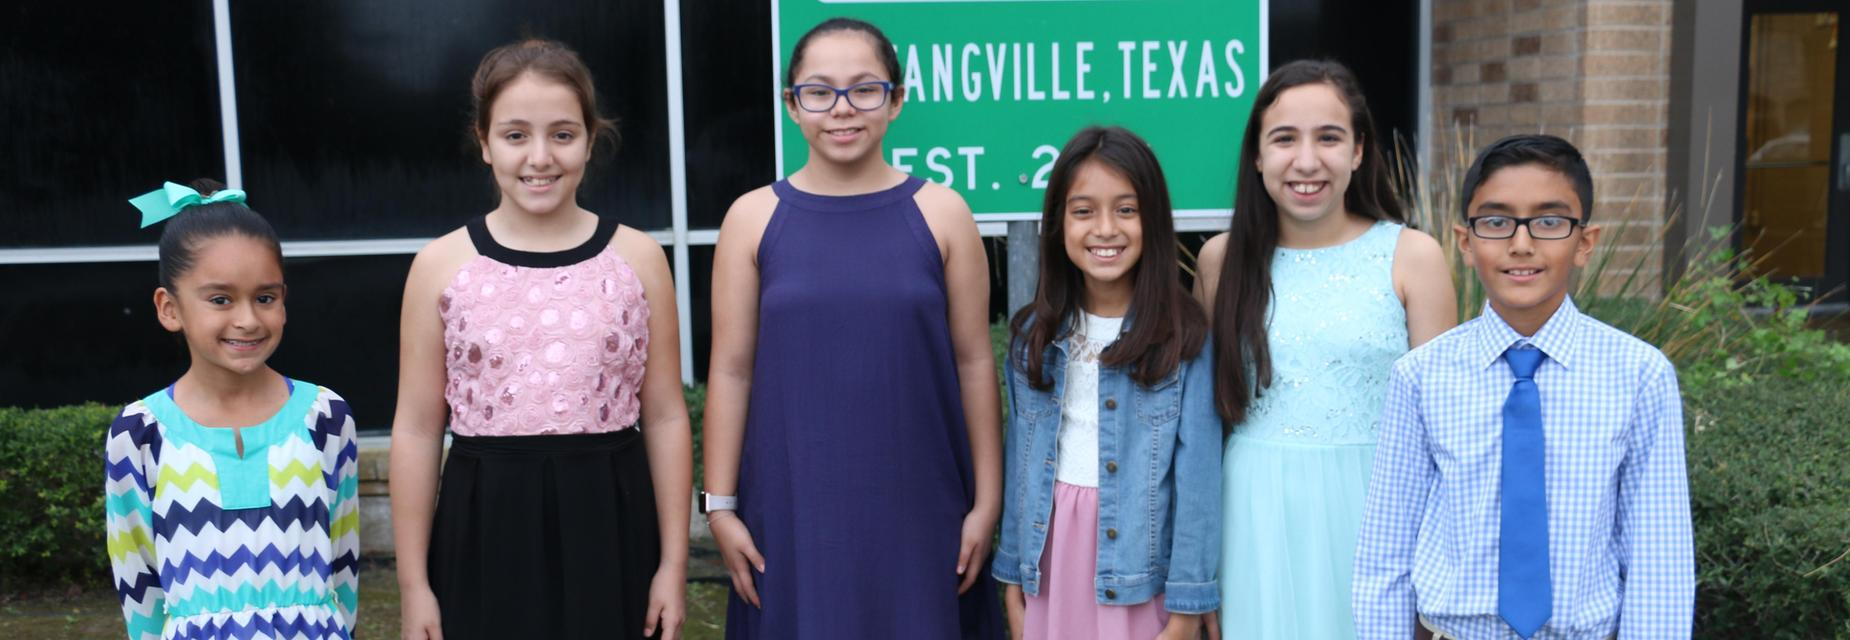 Mims Elementary Mustangville representatives.